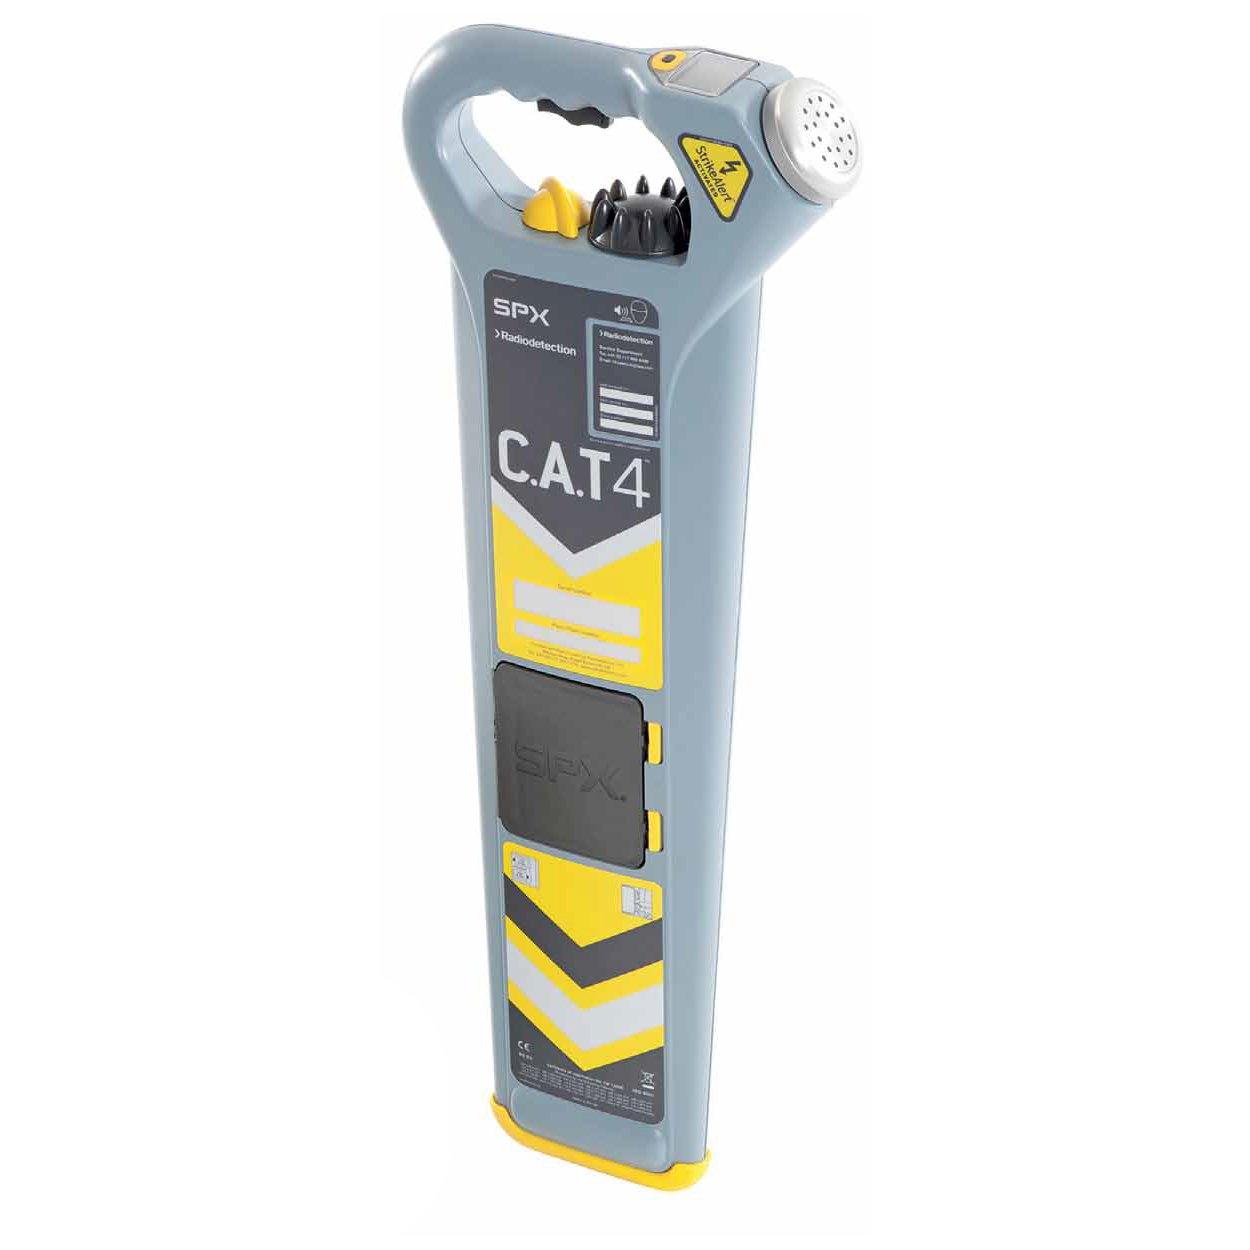 Radiodetection CAT4 Plus Cable Locator Avoidance Tool